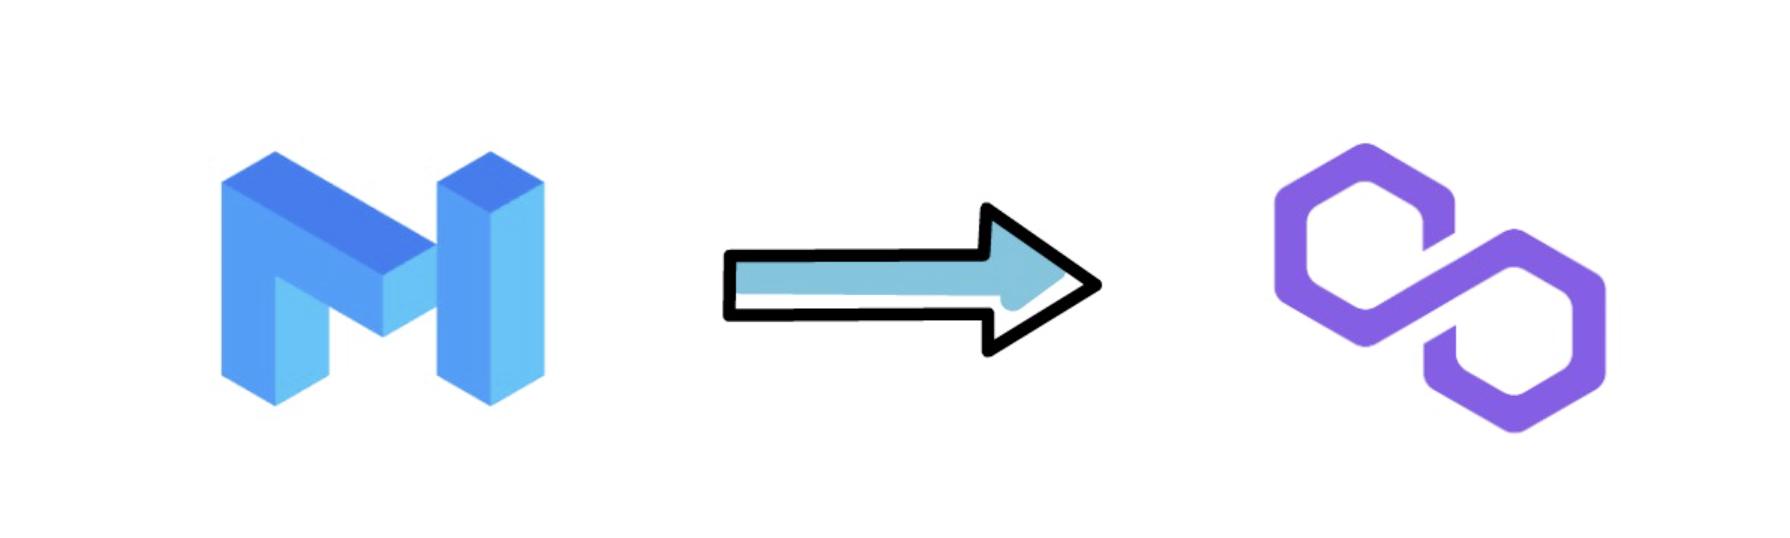 DeFi之道 | 一文了解Polygon(Matic)——以太坊的区块链互联网